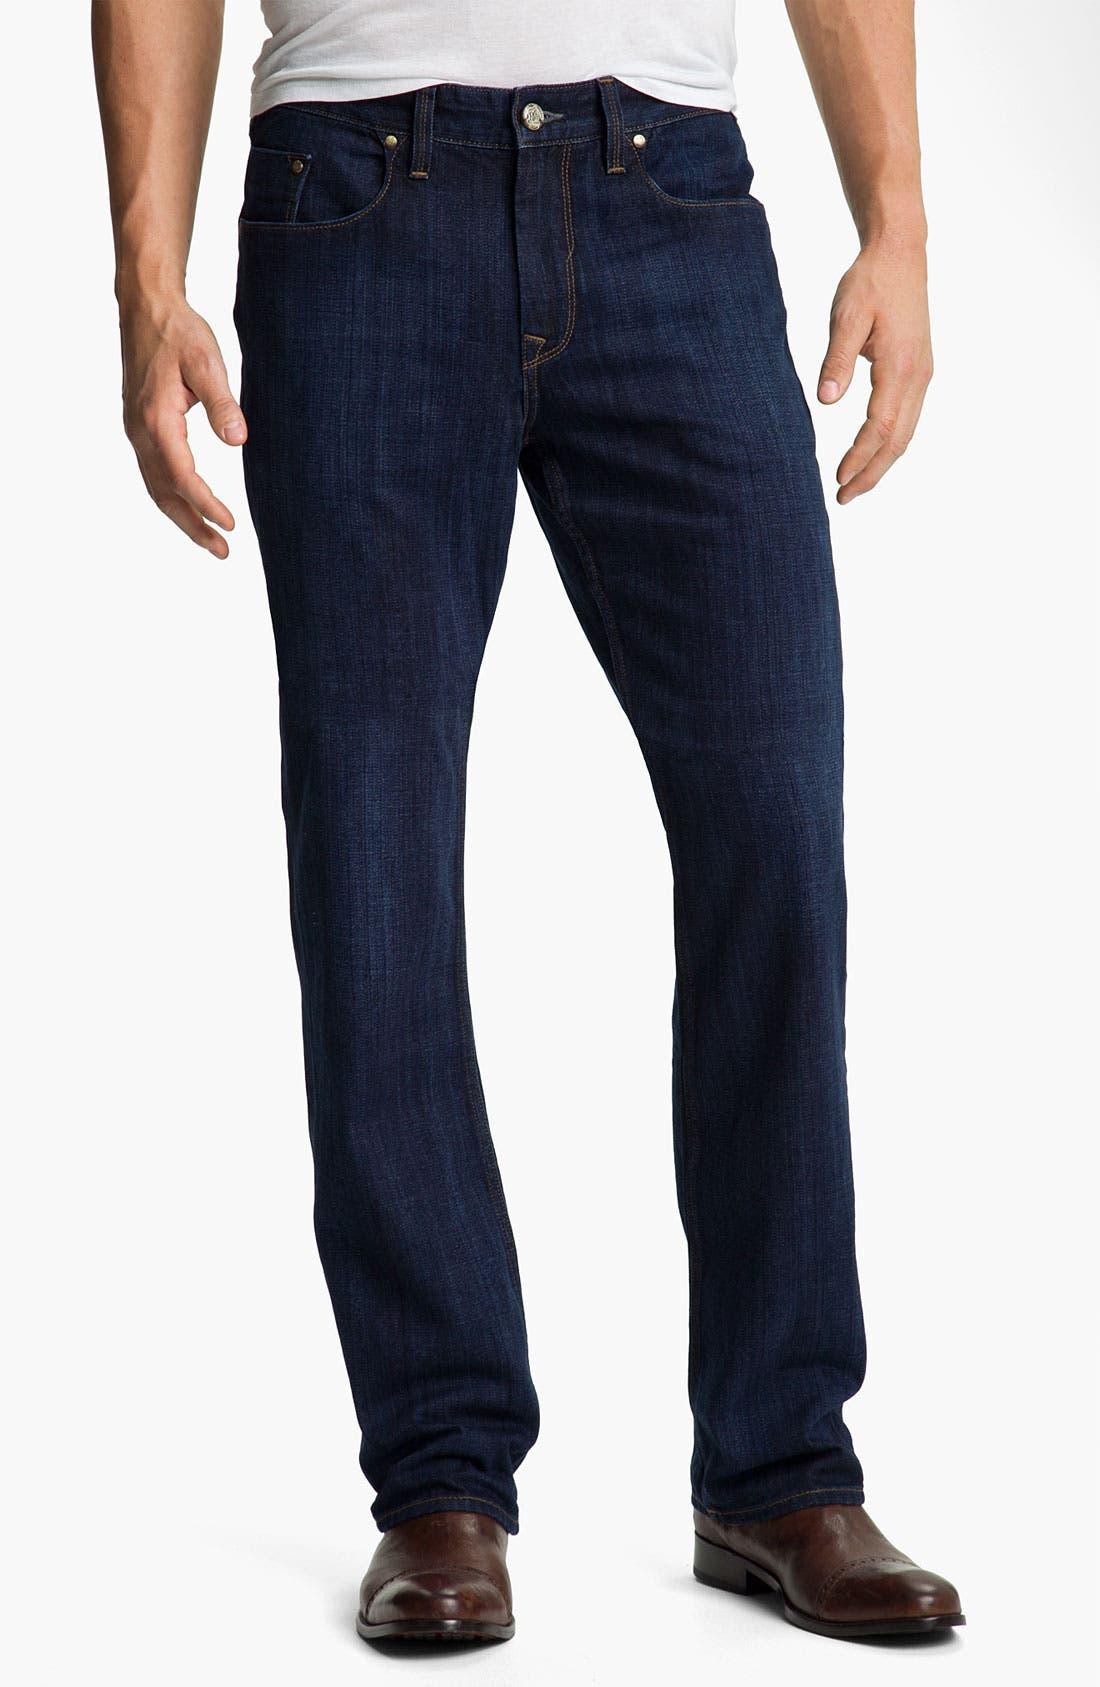 Main Image - Robert Graham Jeans 'Simply Blue' Straight Leg Jeans (Indigo)